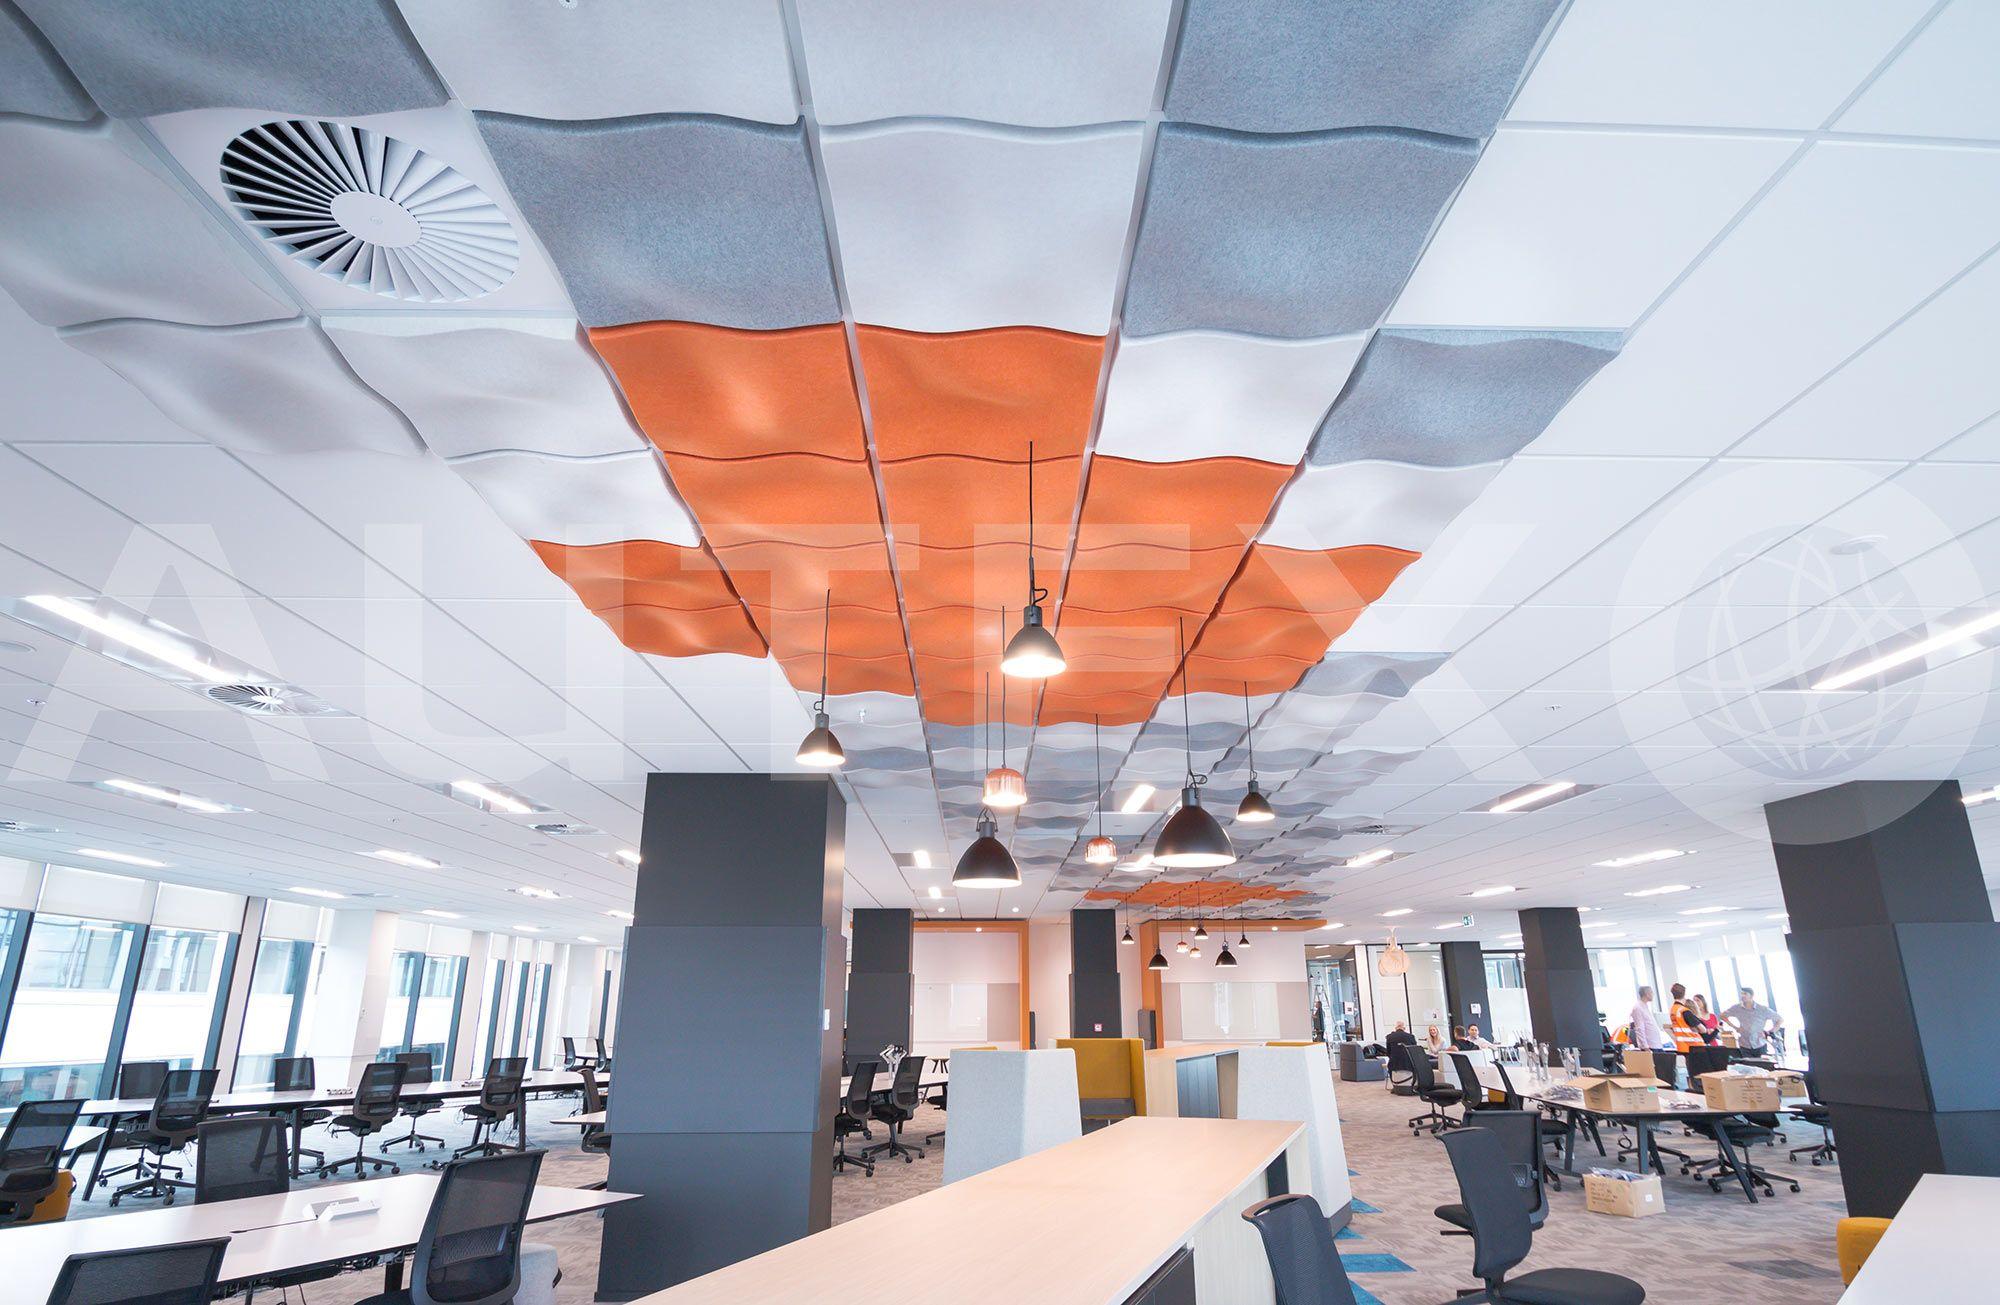 Autex interior acoustics quietspace 3d ceiling tiles kotahi autex interior acoustics quietspace 3d ceiling tiles kotahi logistics auckland nz dailygadgetfo Choice Image